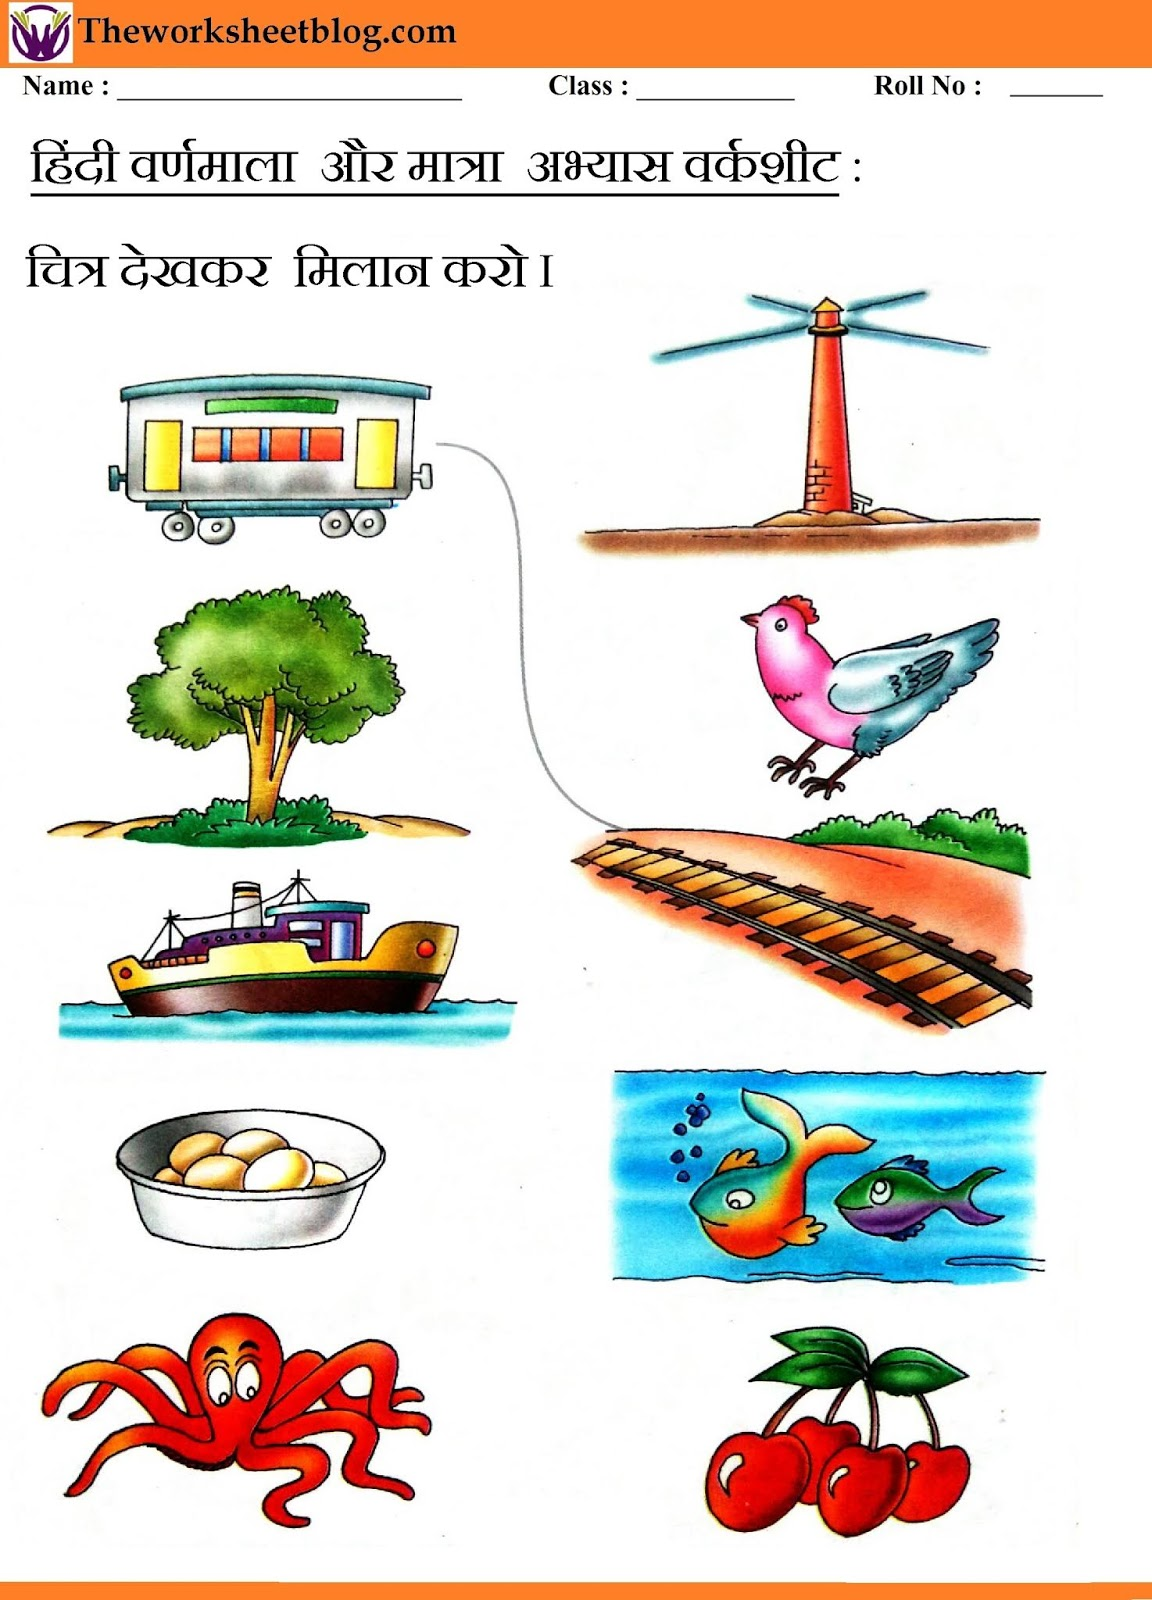 Worksheet For Class 1 Hindi Matra